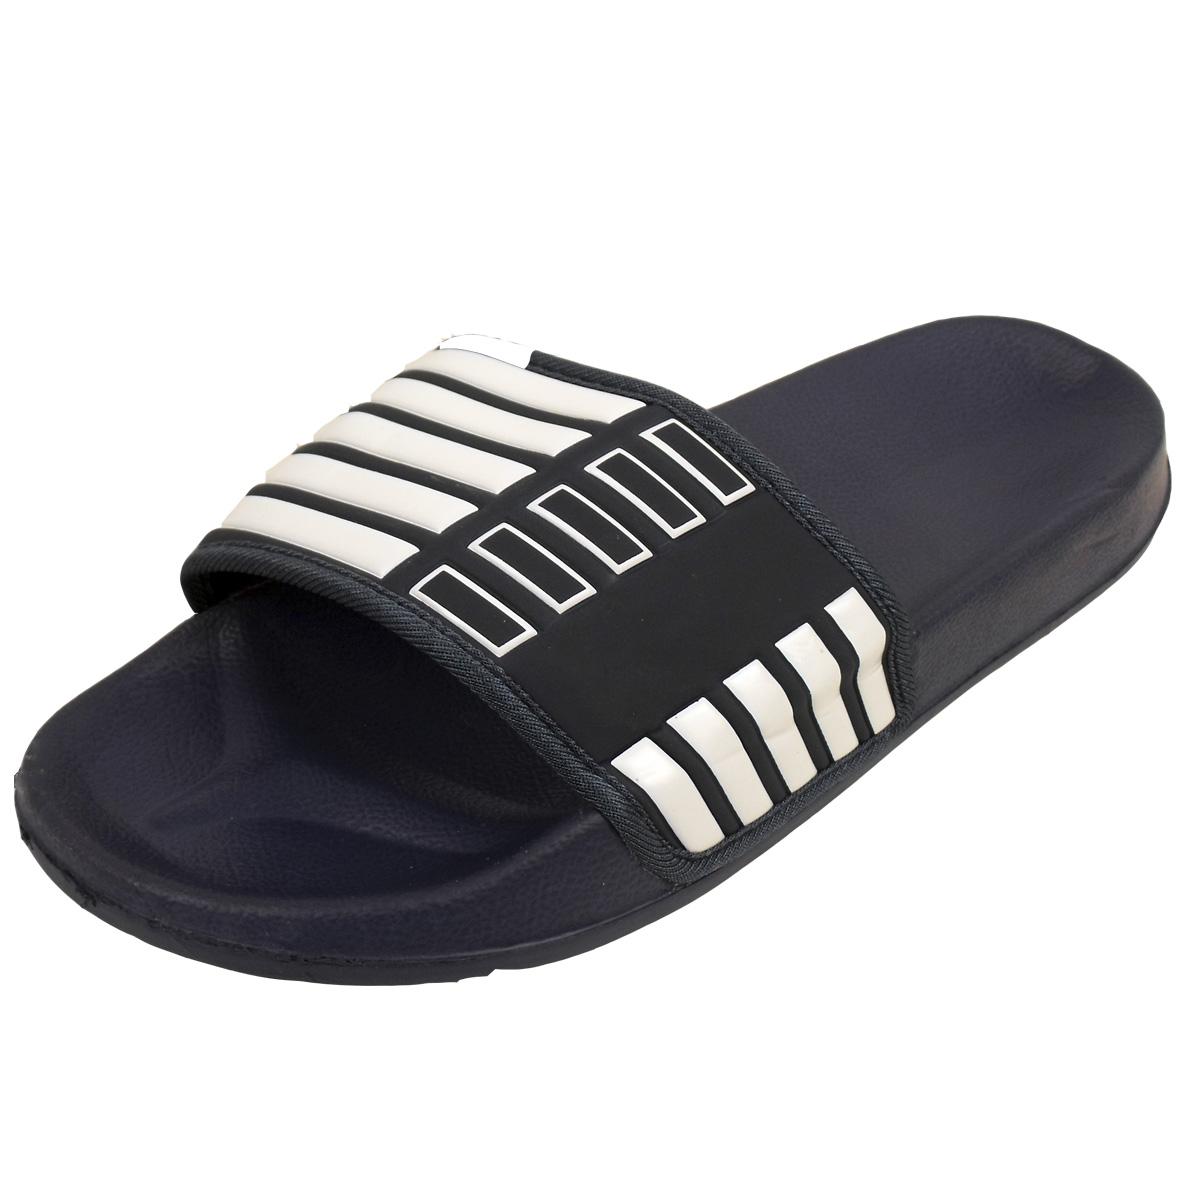 7eca4f447f5 Details about Mens Slide Mules Sandals Pool Beach Water Flip Flop Flops  Sandal Shower Shoes